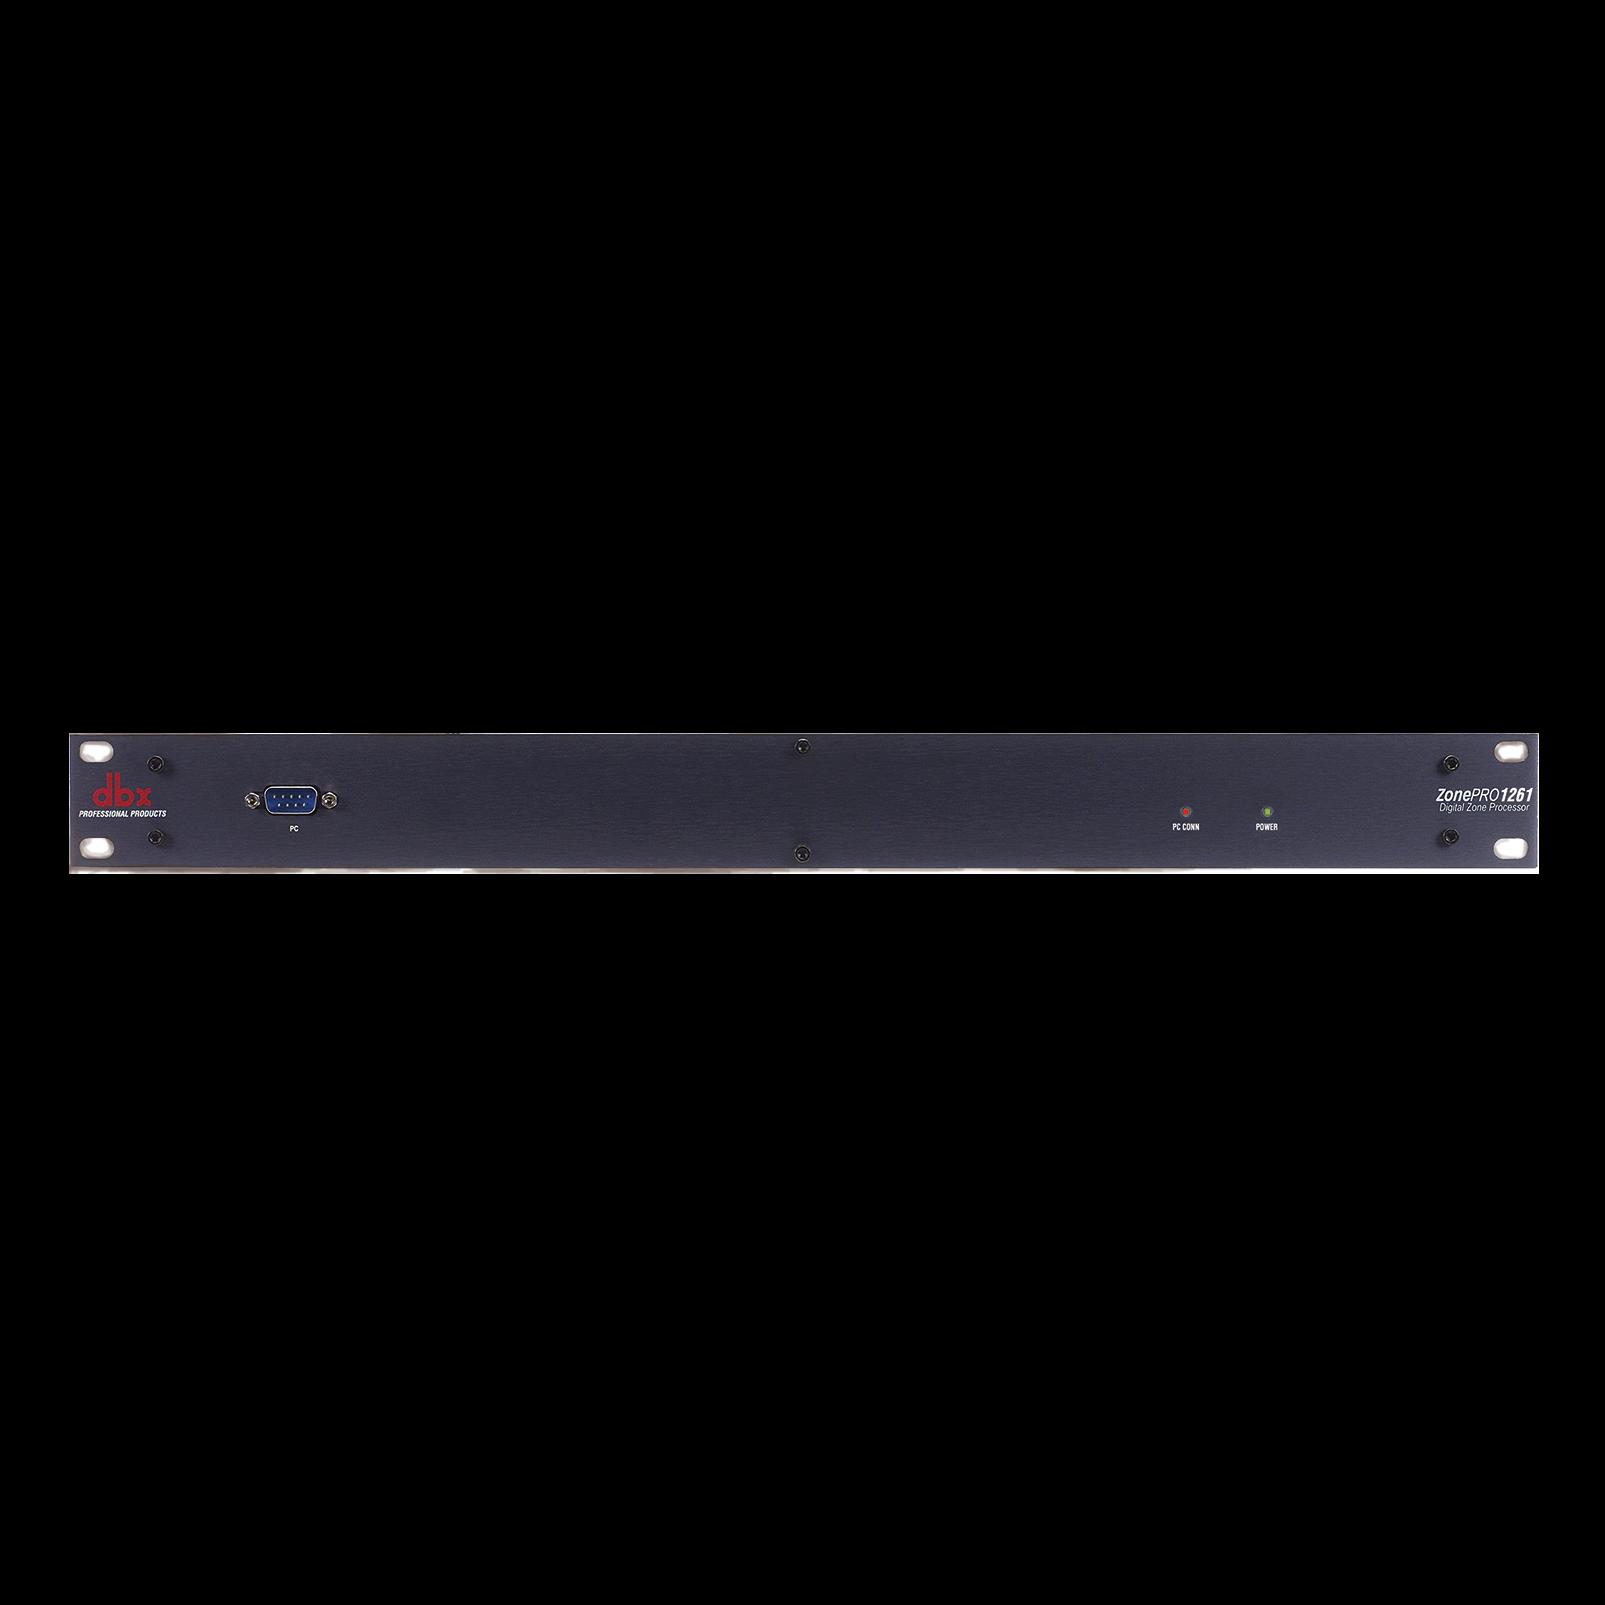 ZonePro 1261 - Black - 12x6 Digital Zone Processor - Hero